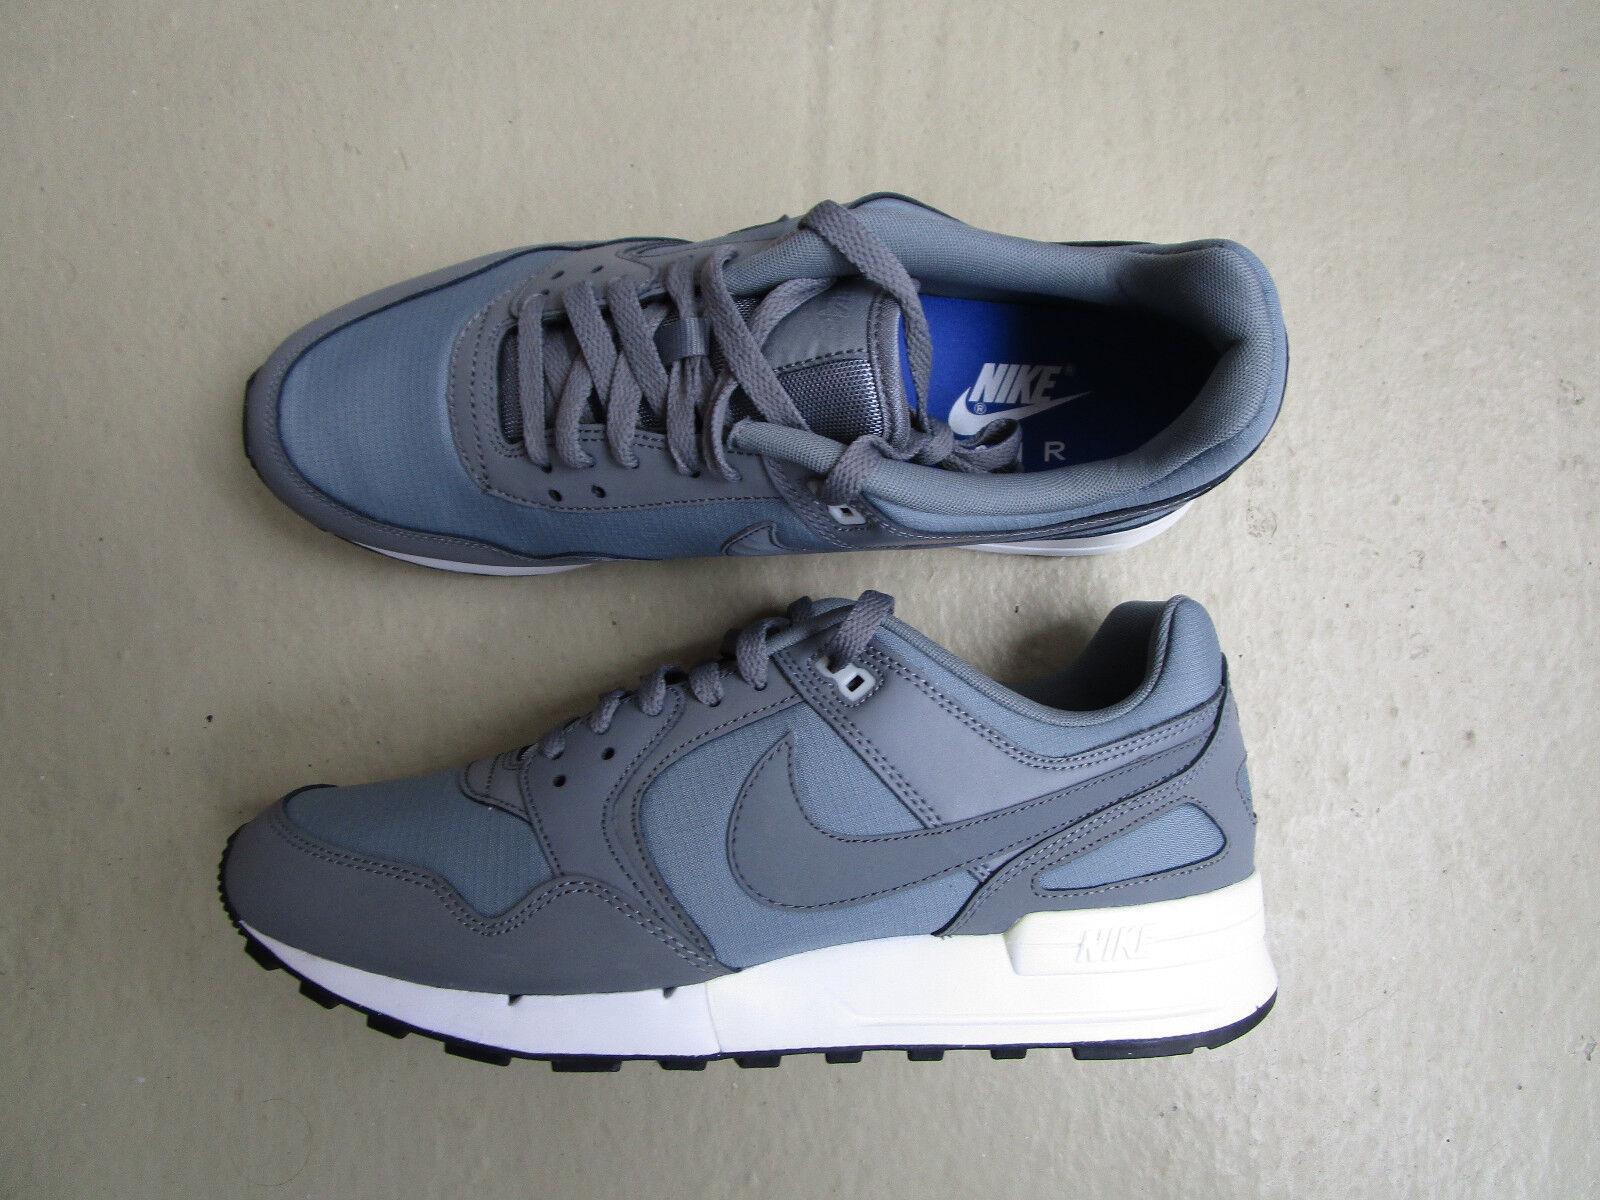 Nike Air Pegasus 89 45 Cool Grey/Comet Blue/White